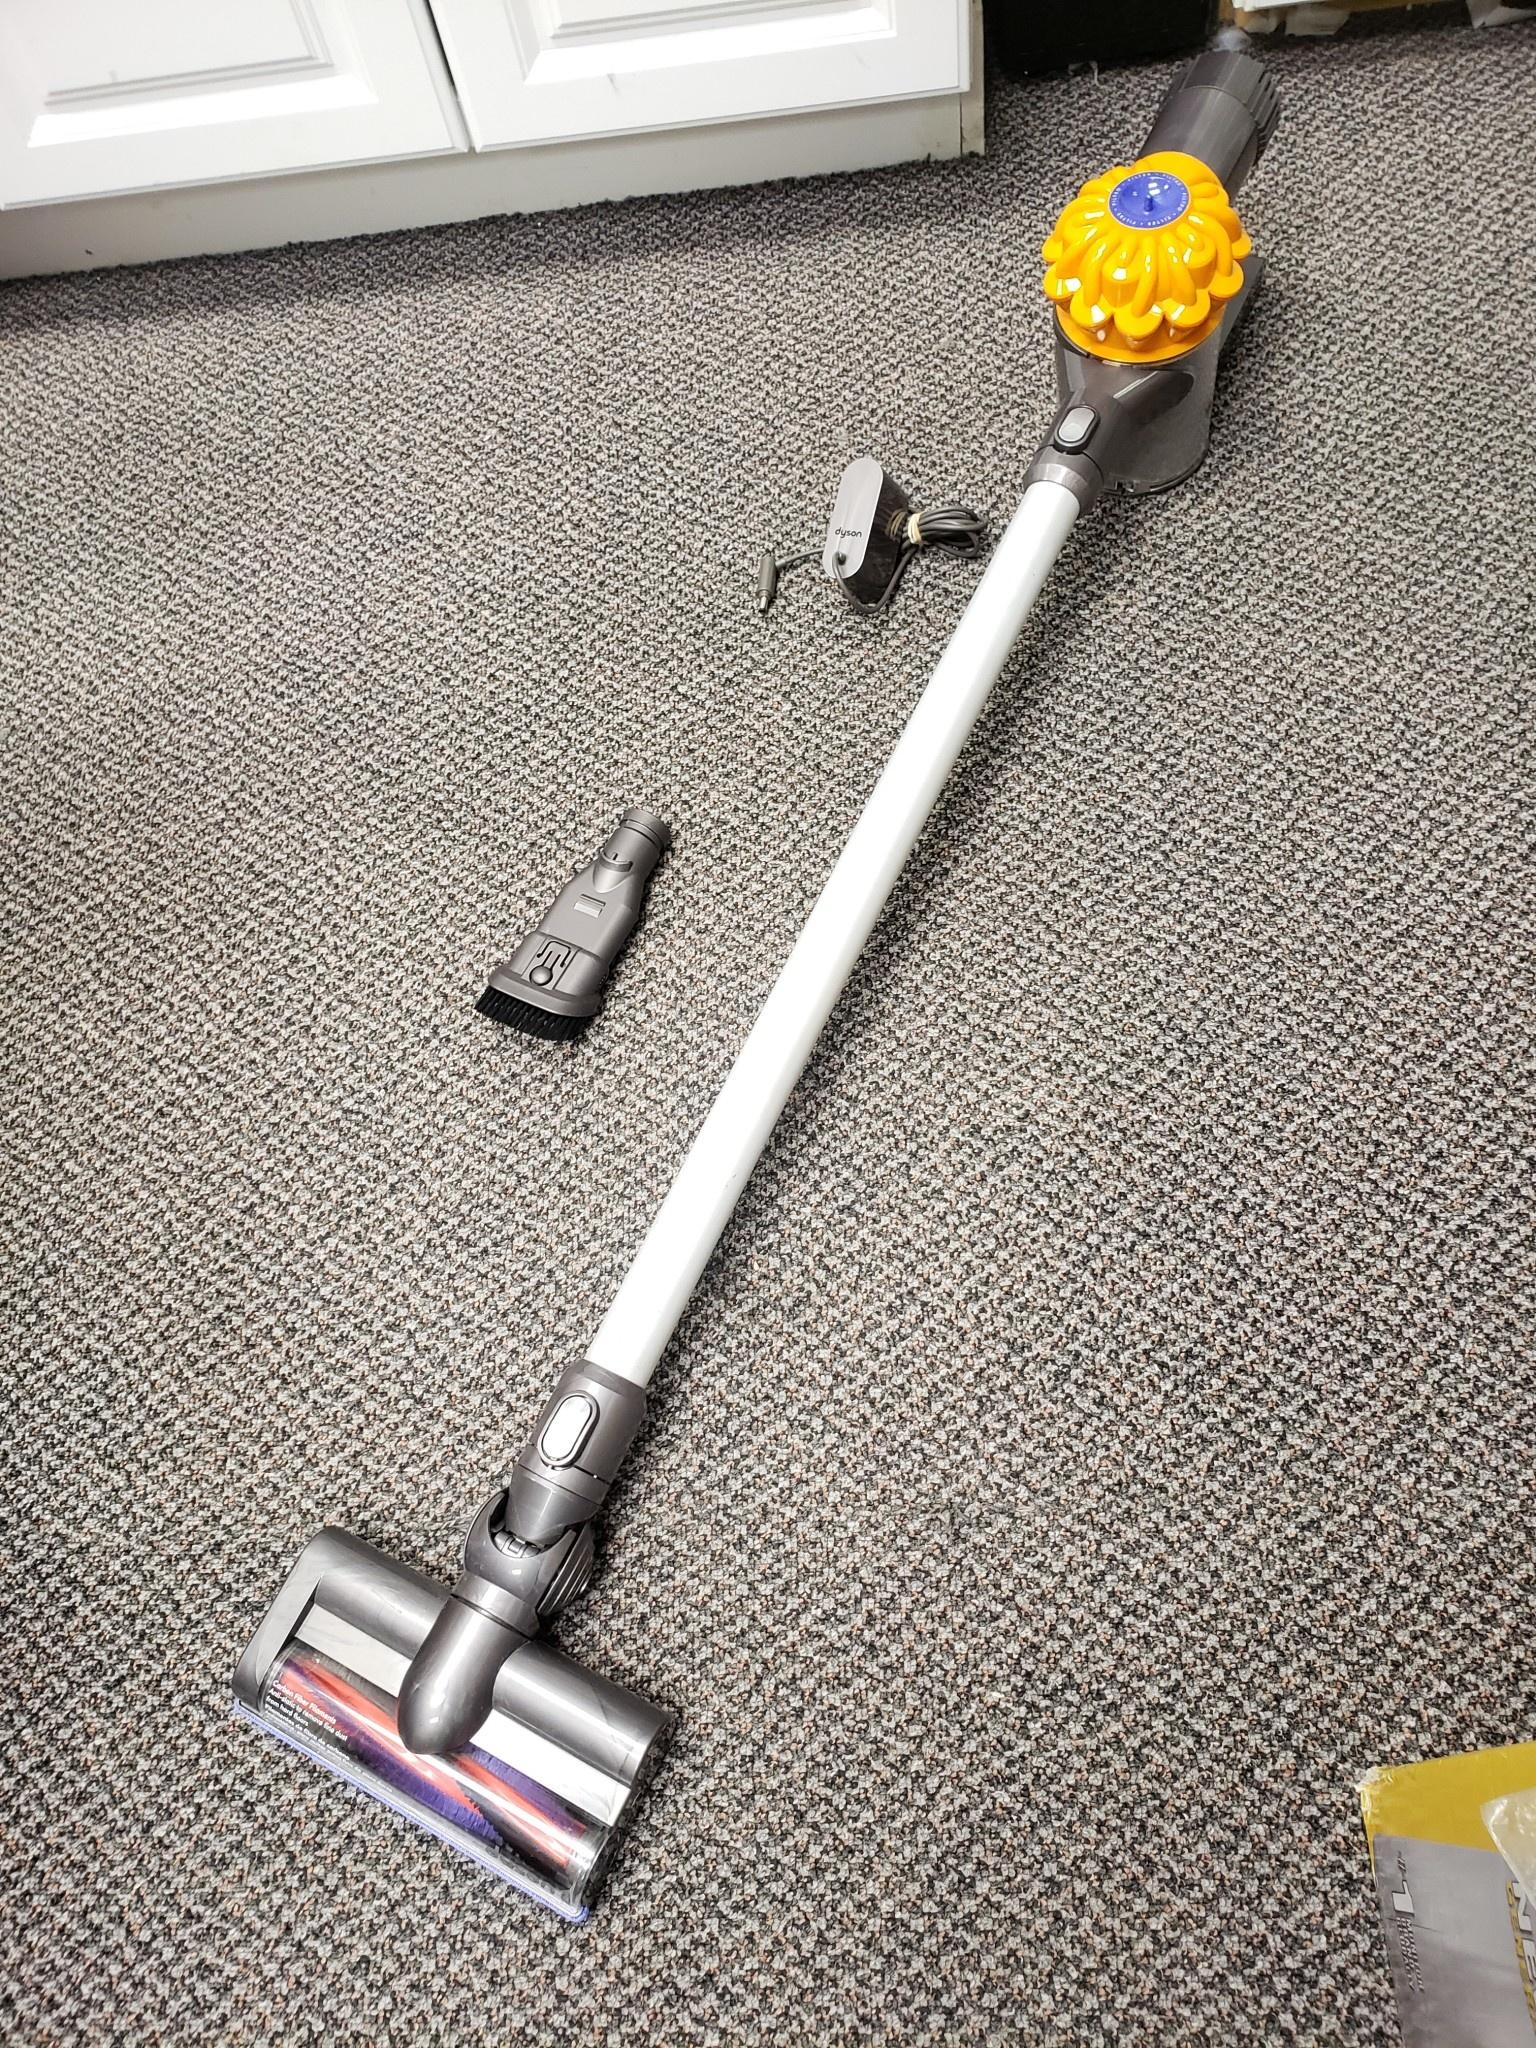 Dyson DC59 / SV03 Cordless Stick Vacuum